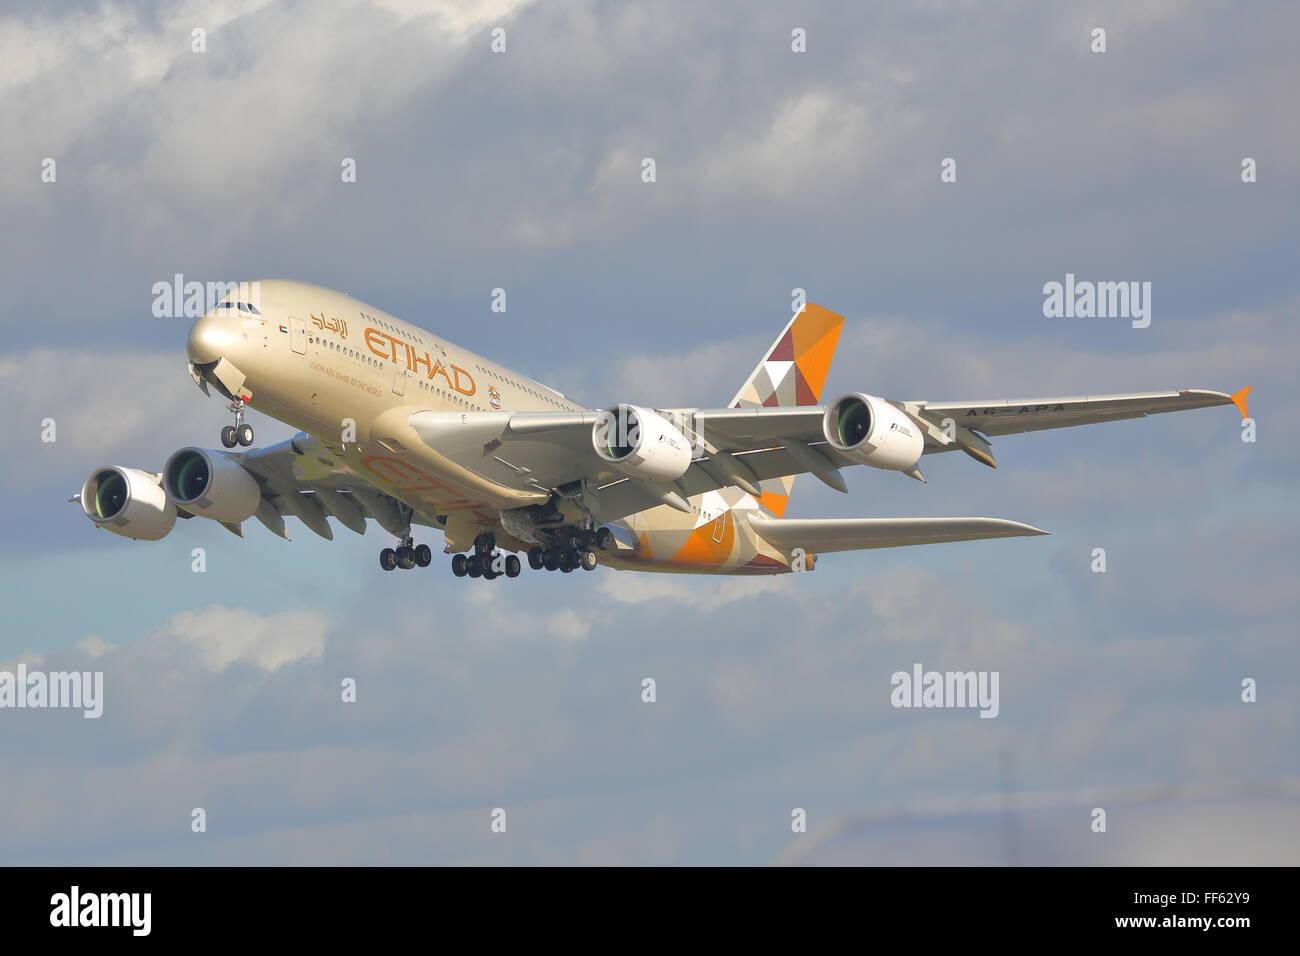 Etihad Airways Airbus A380-800 A6-APA departing from London Heathrow Airport, UK - Stock Image